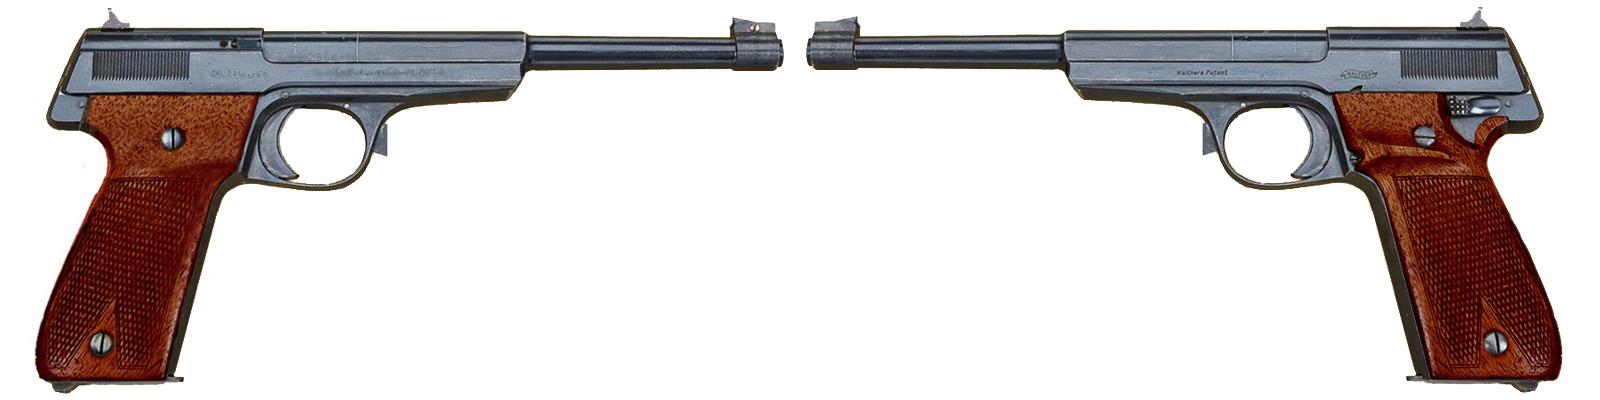 Walther Sportpistole 1925